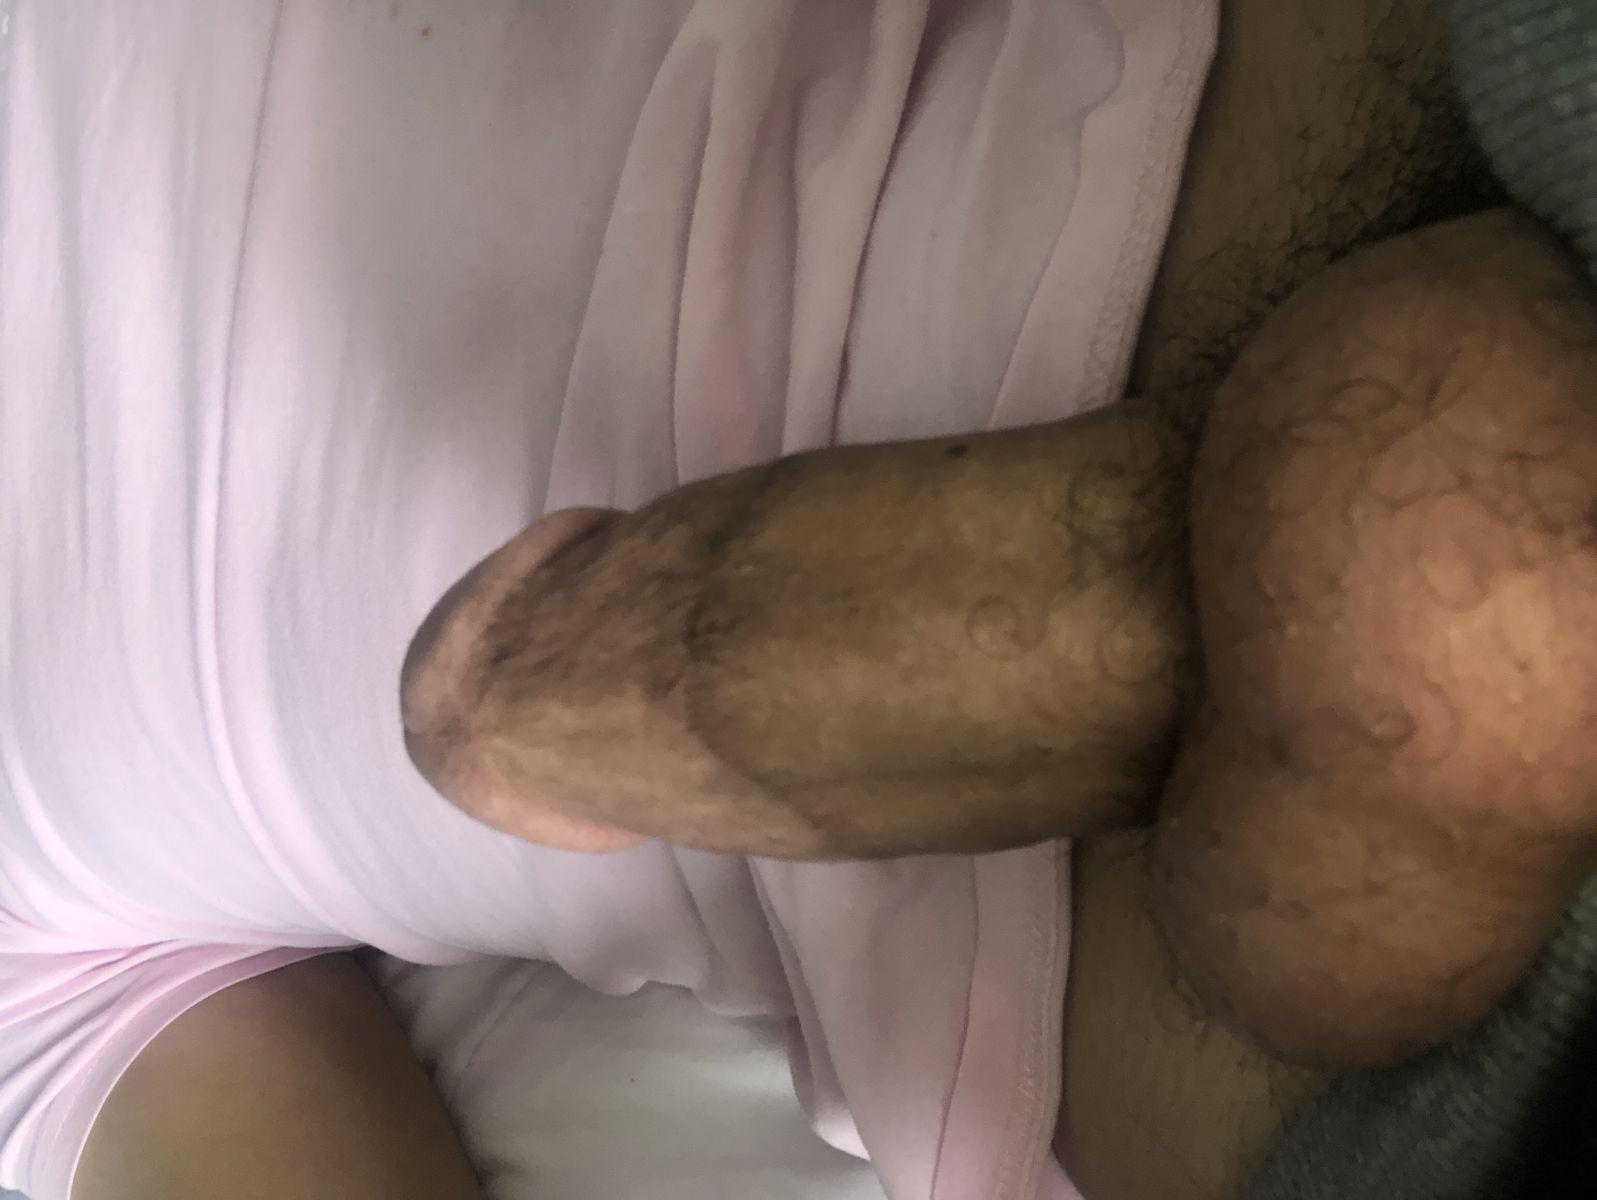 sexaddicted uit Noord-Holland,Nederland